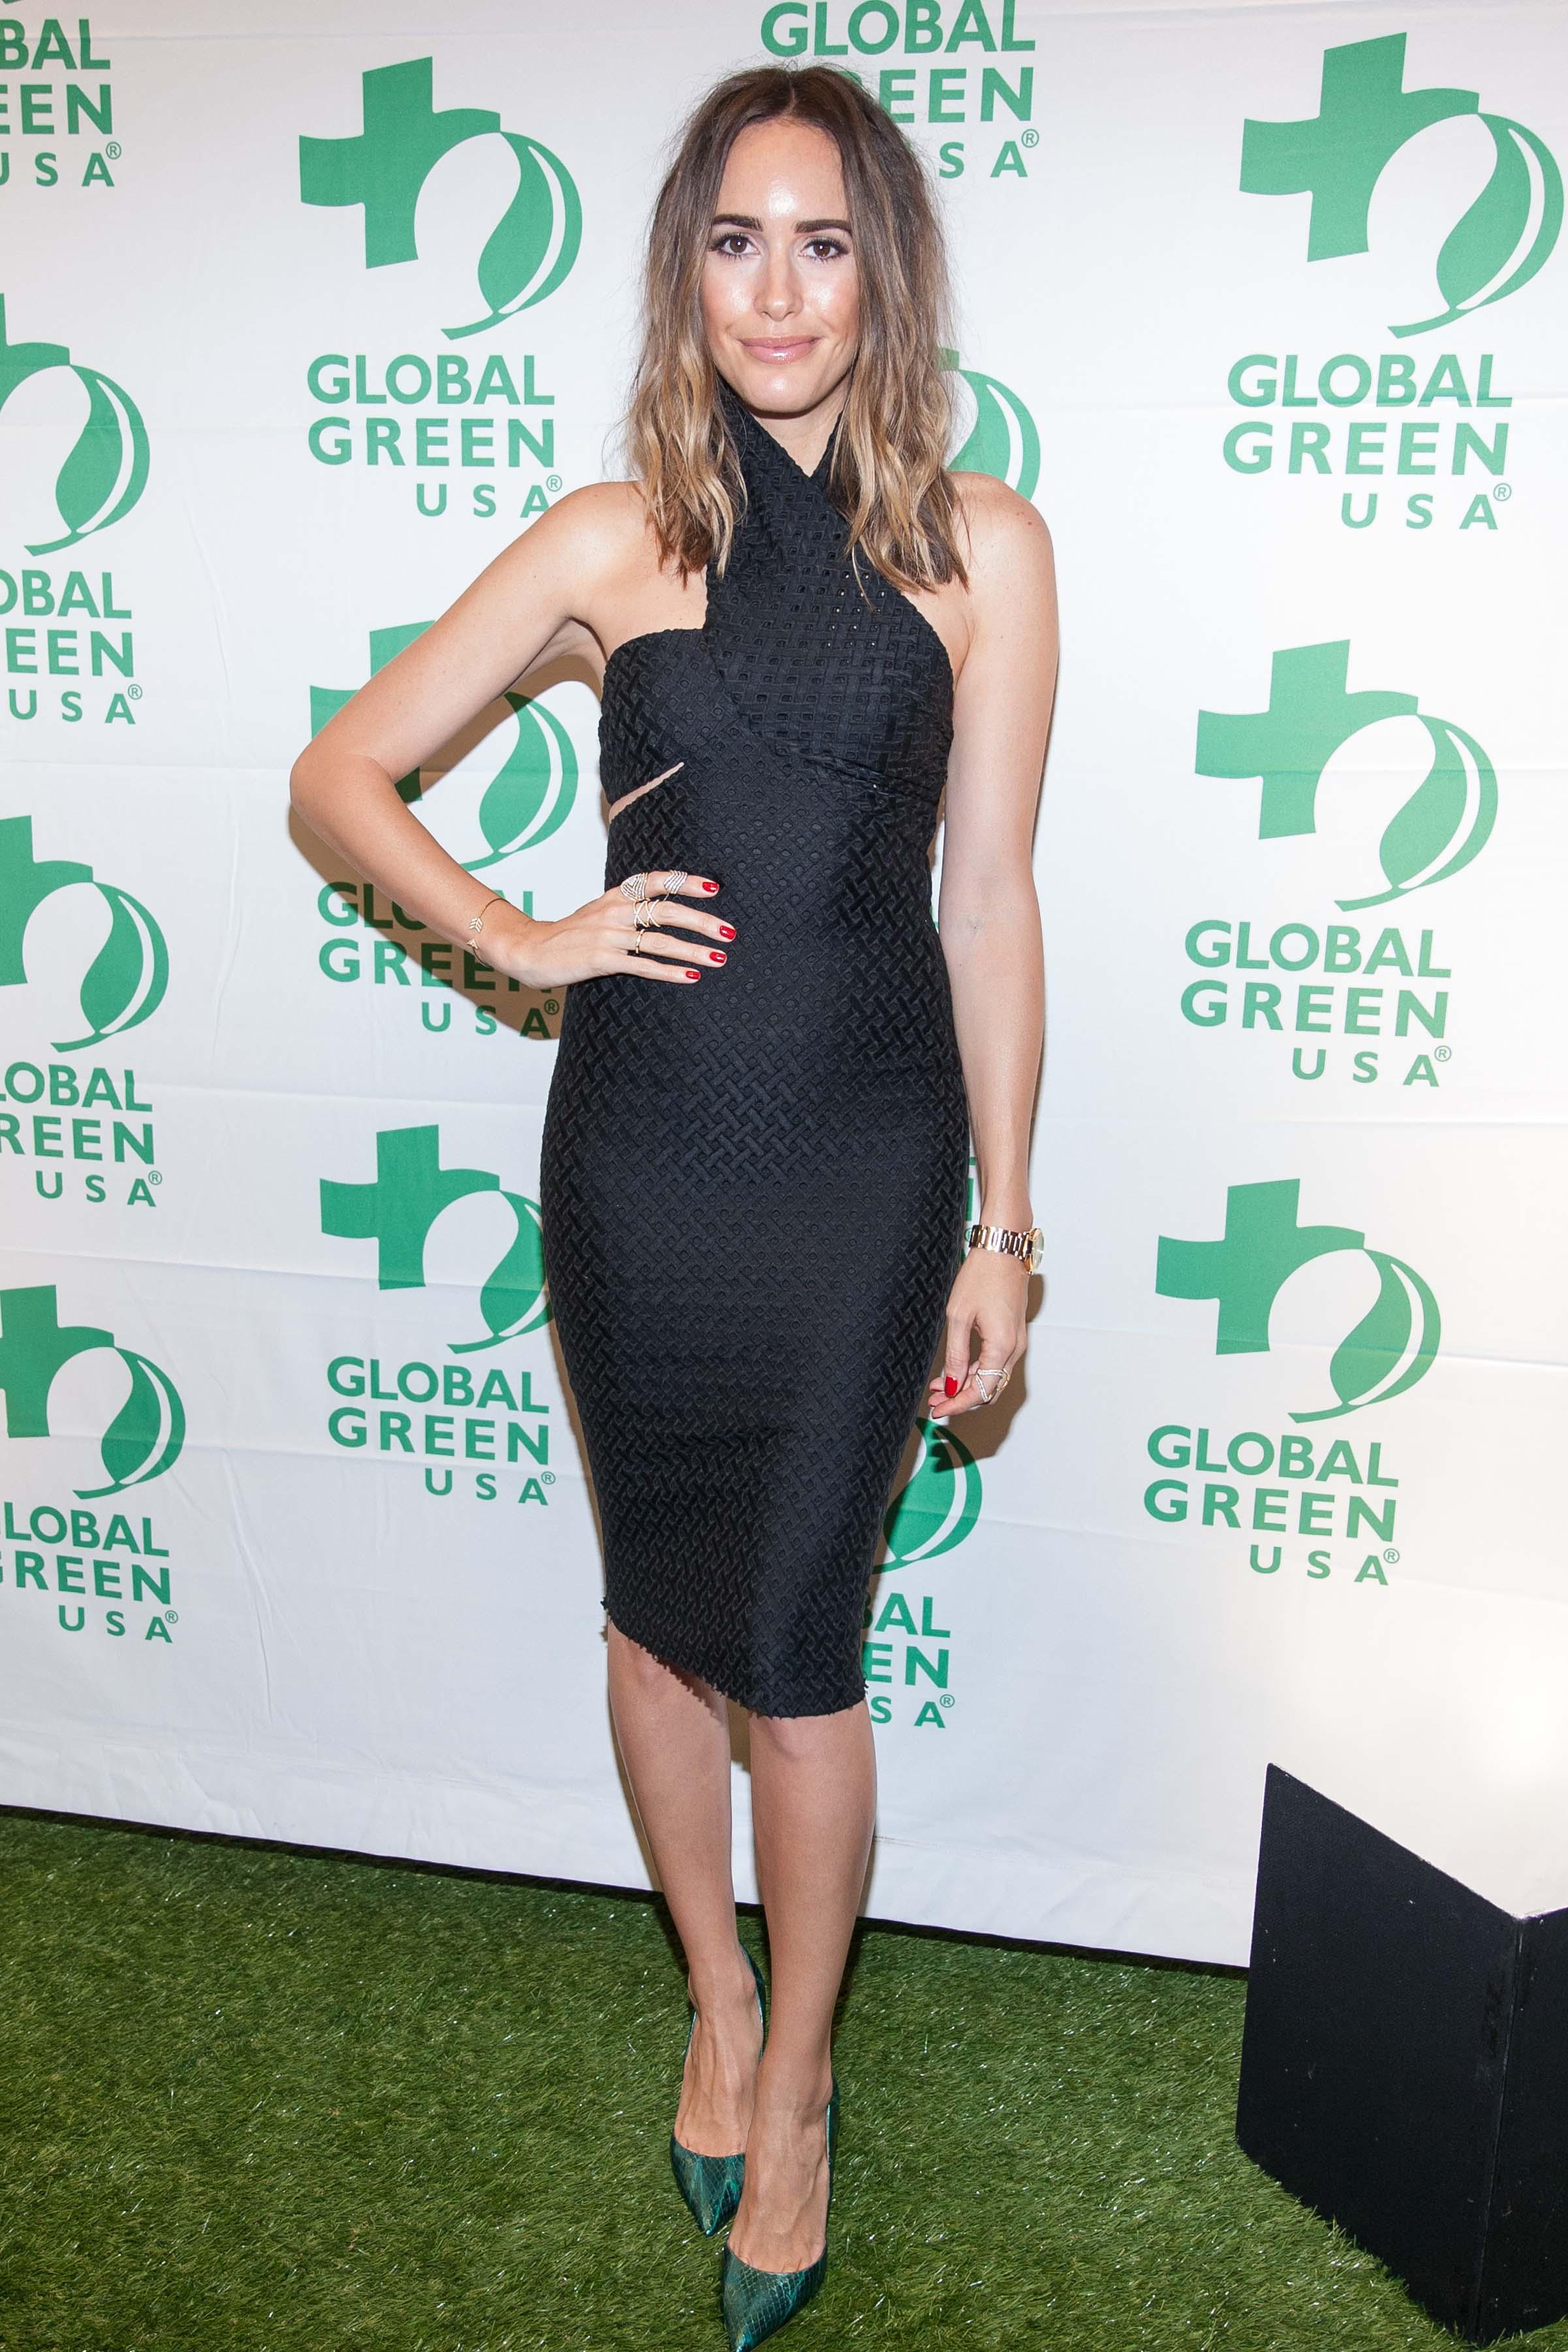 Goldie Hawn Vanessa Hudgens Navid Negahban Catt Sadler